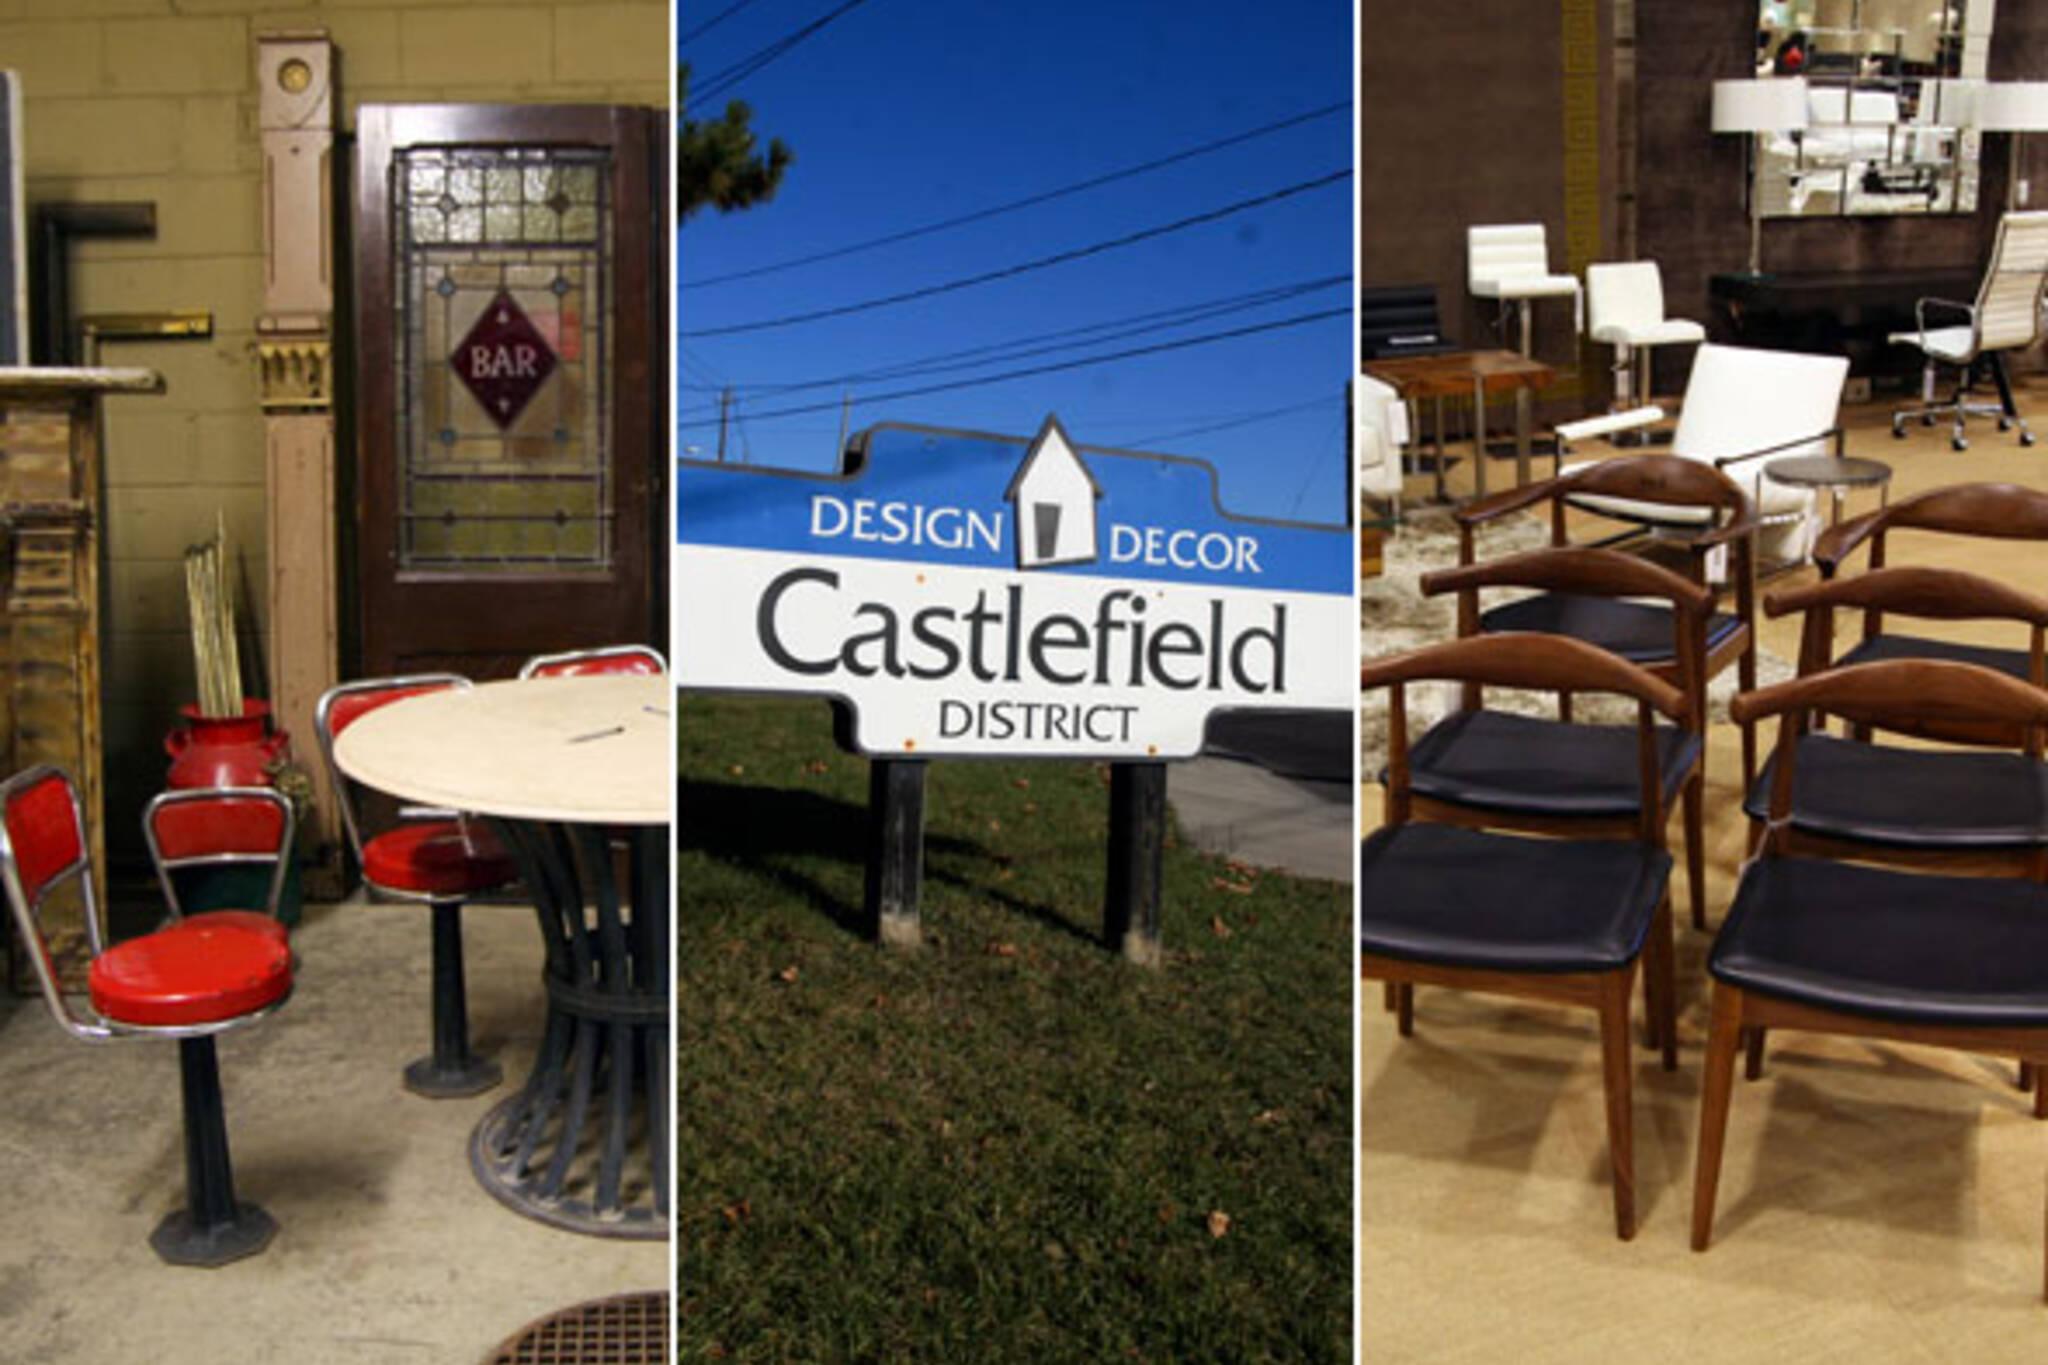 Castlefield Design District